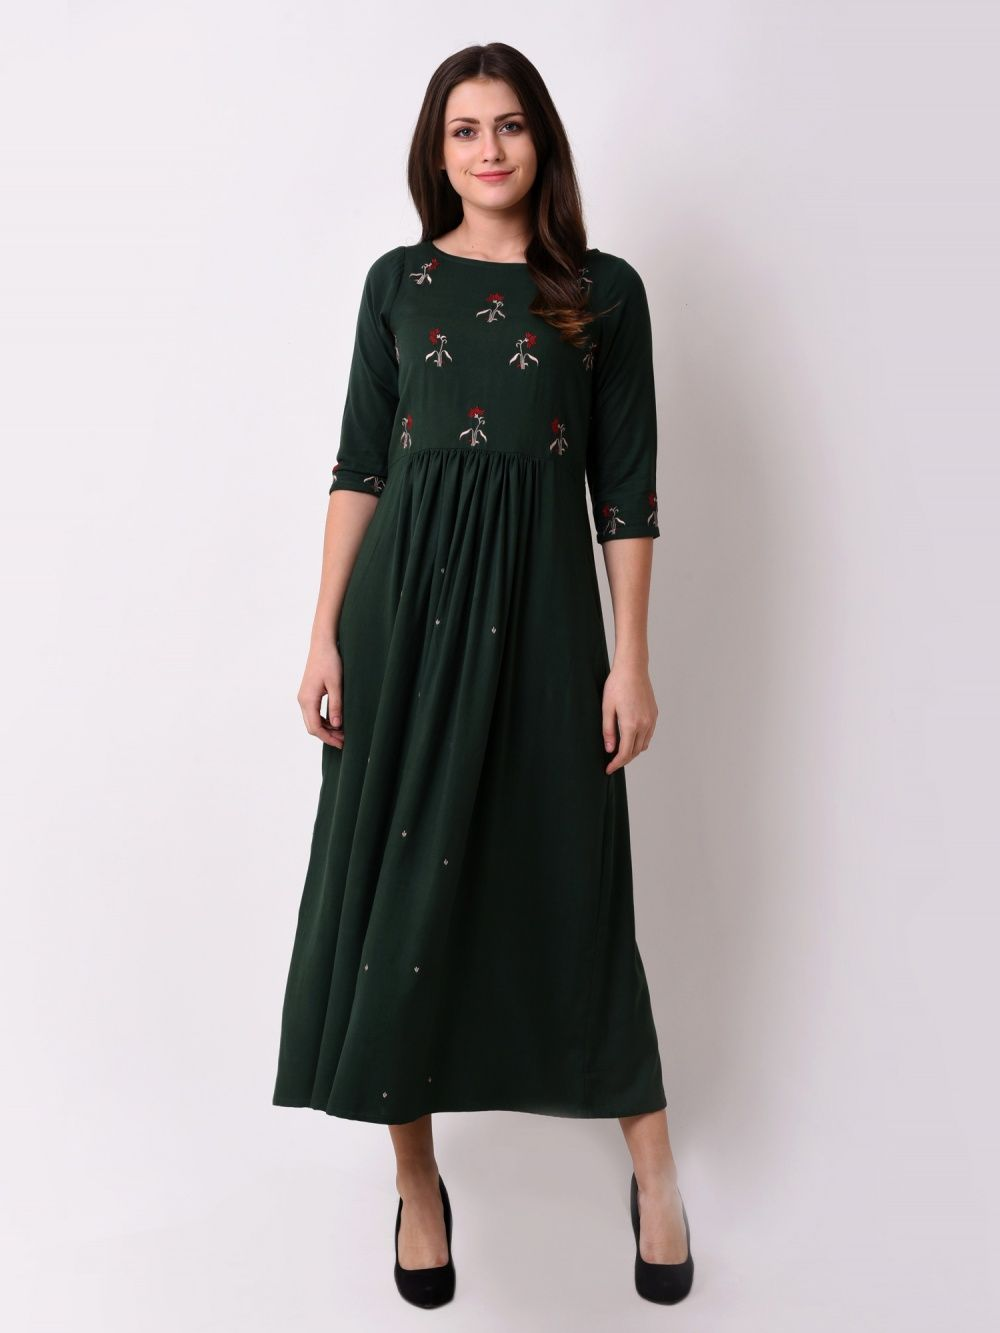 526a3f4e3a6633 VRITTA Dresses : Buy VRITTA Women'S Floral Gathered Maxi Dress ...